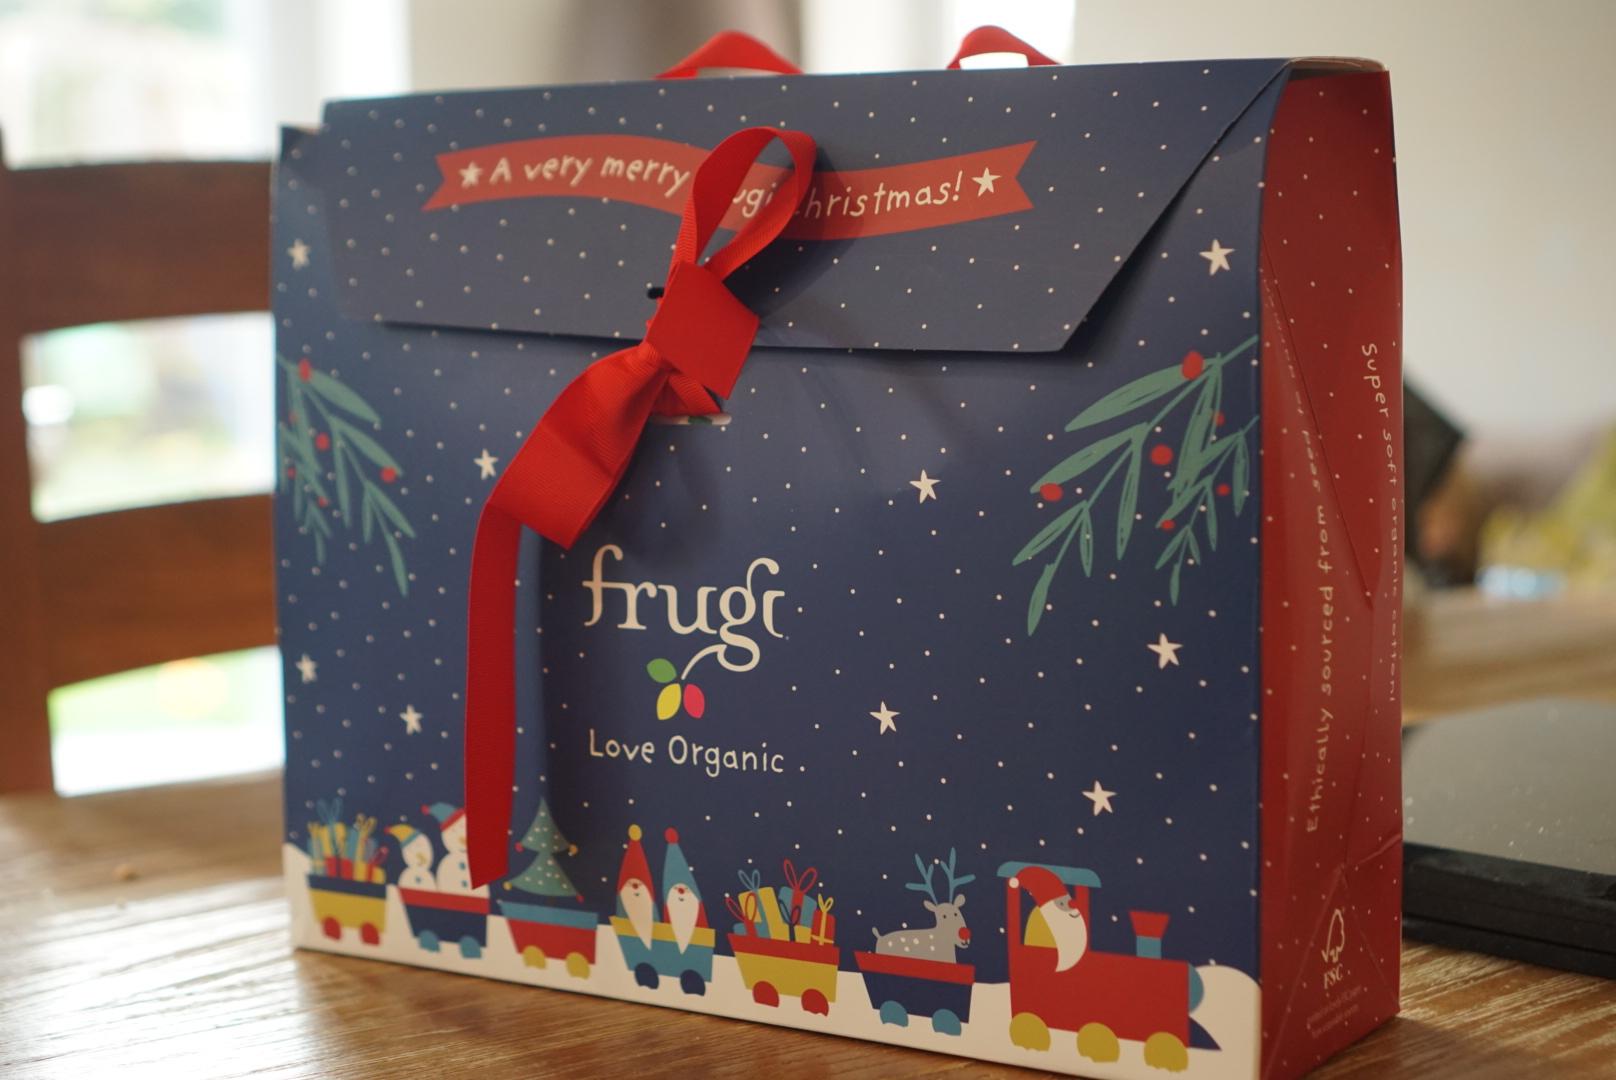 We love Frugi